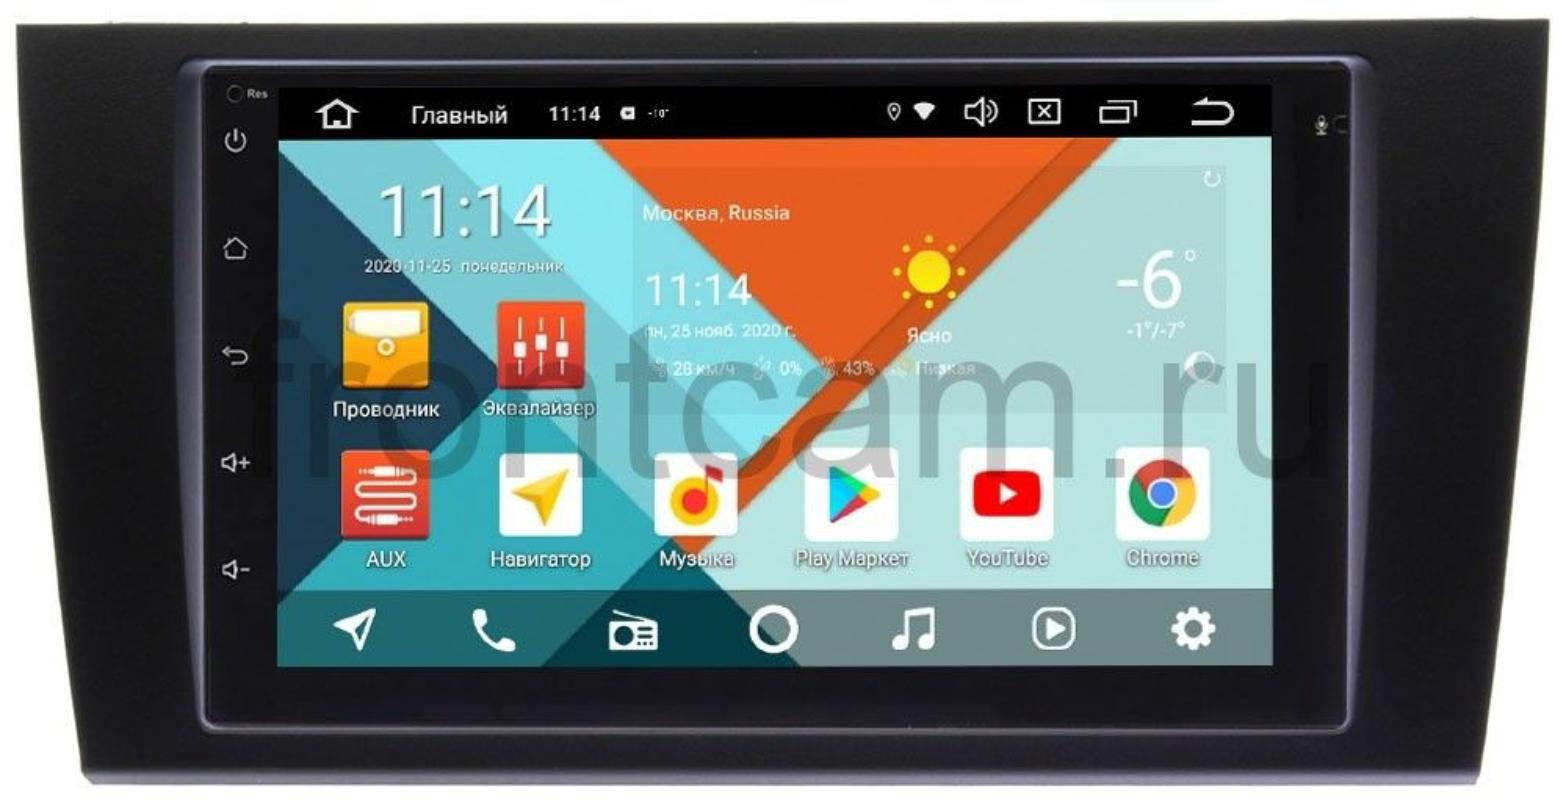 Магнитола для Lexus GS II Wide Media KS7001QR-3/32-RP-TYAR16XB-126 на Android 10(DSP CarPlay 4G-SIM) (+ Камера заднего вида в подарок!)